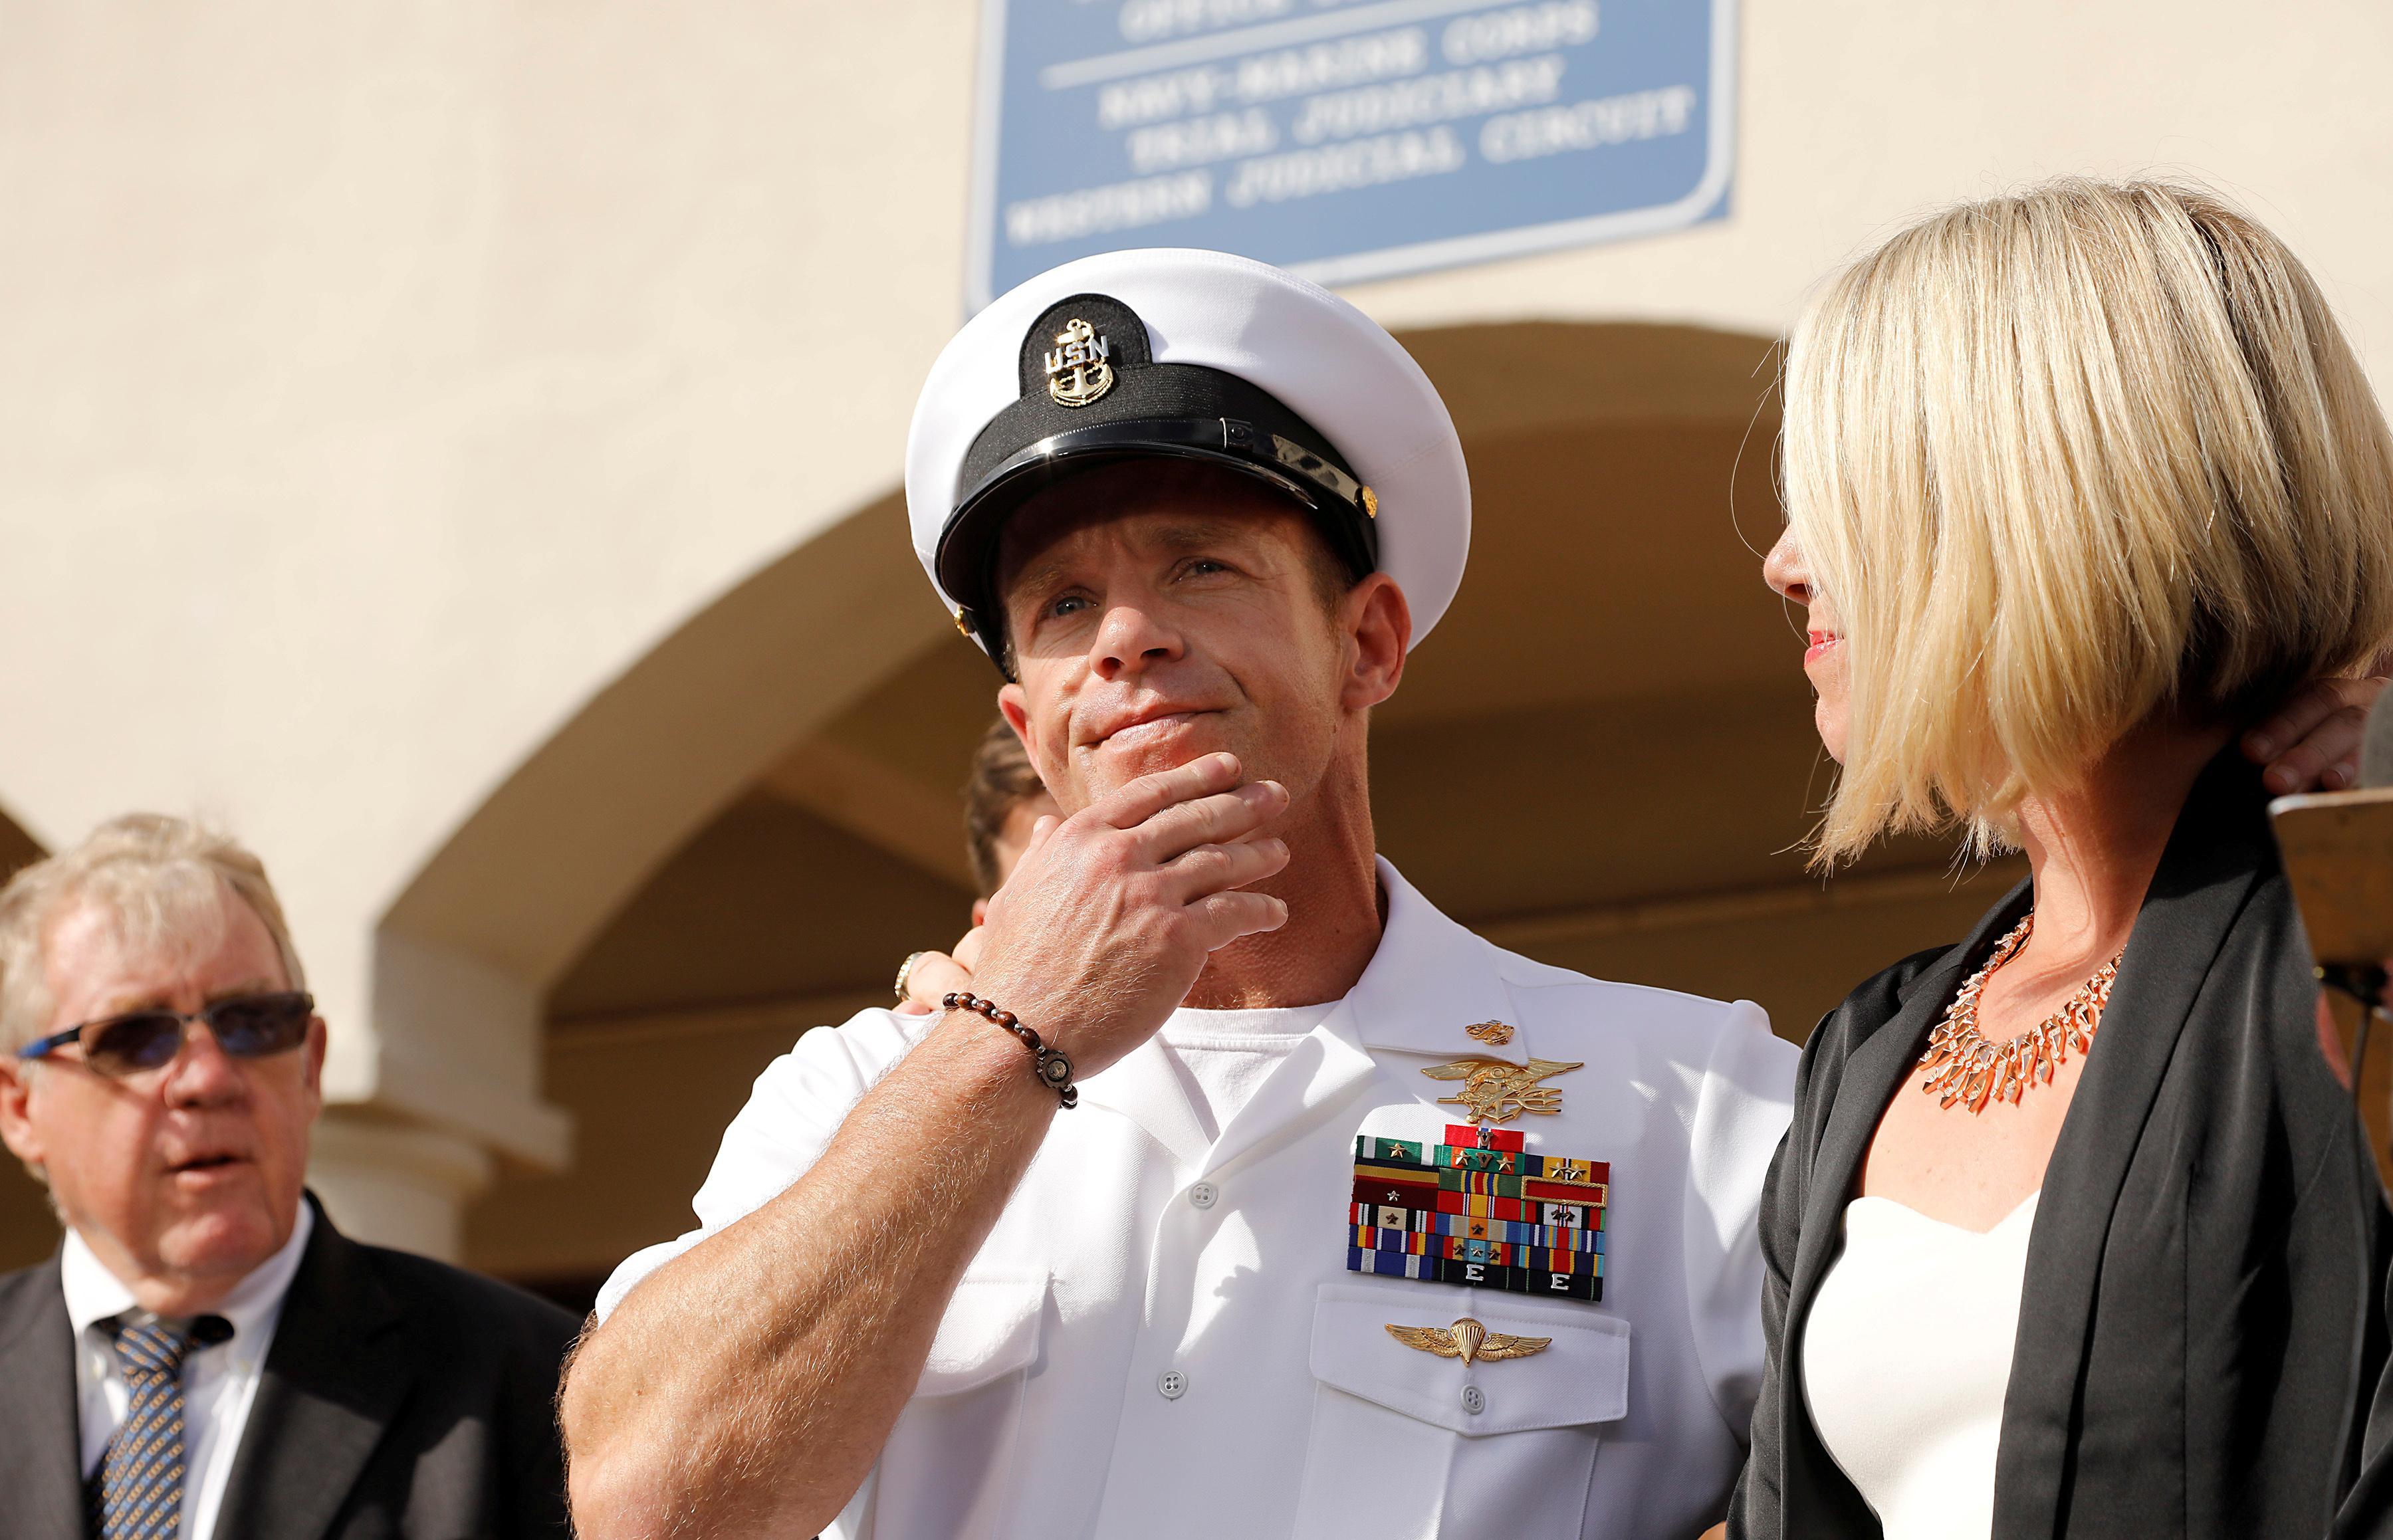 Exclusive: U.S. Navy secretary backs SEAL's expulsion review,...